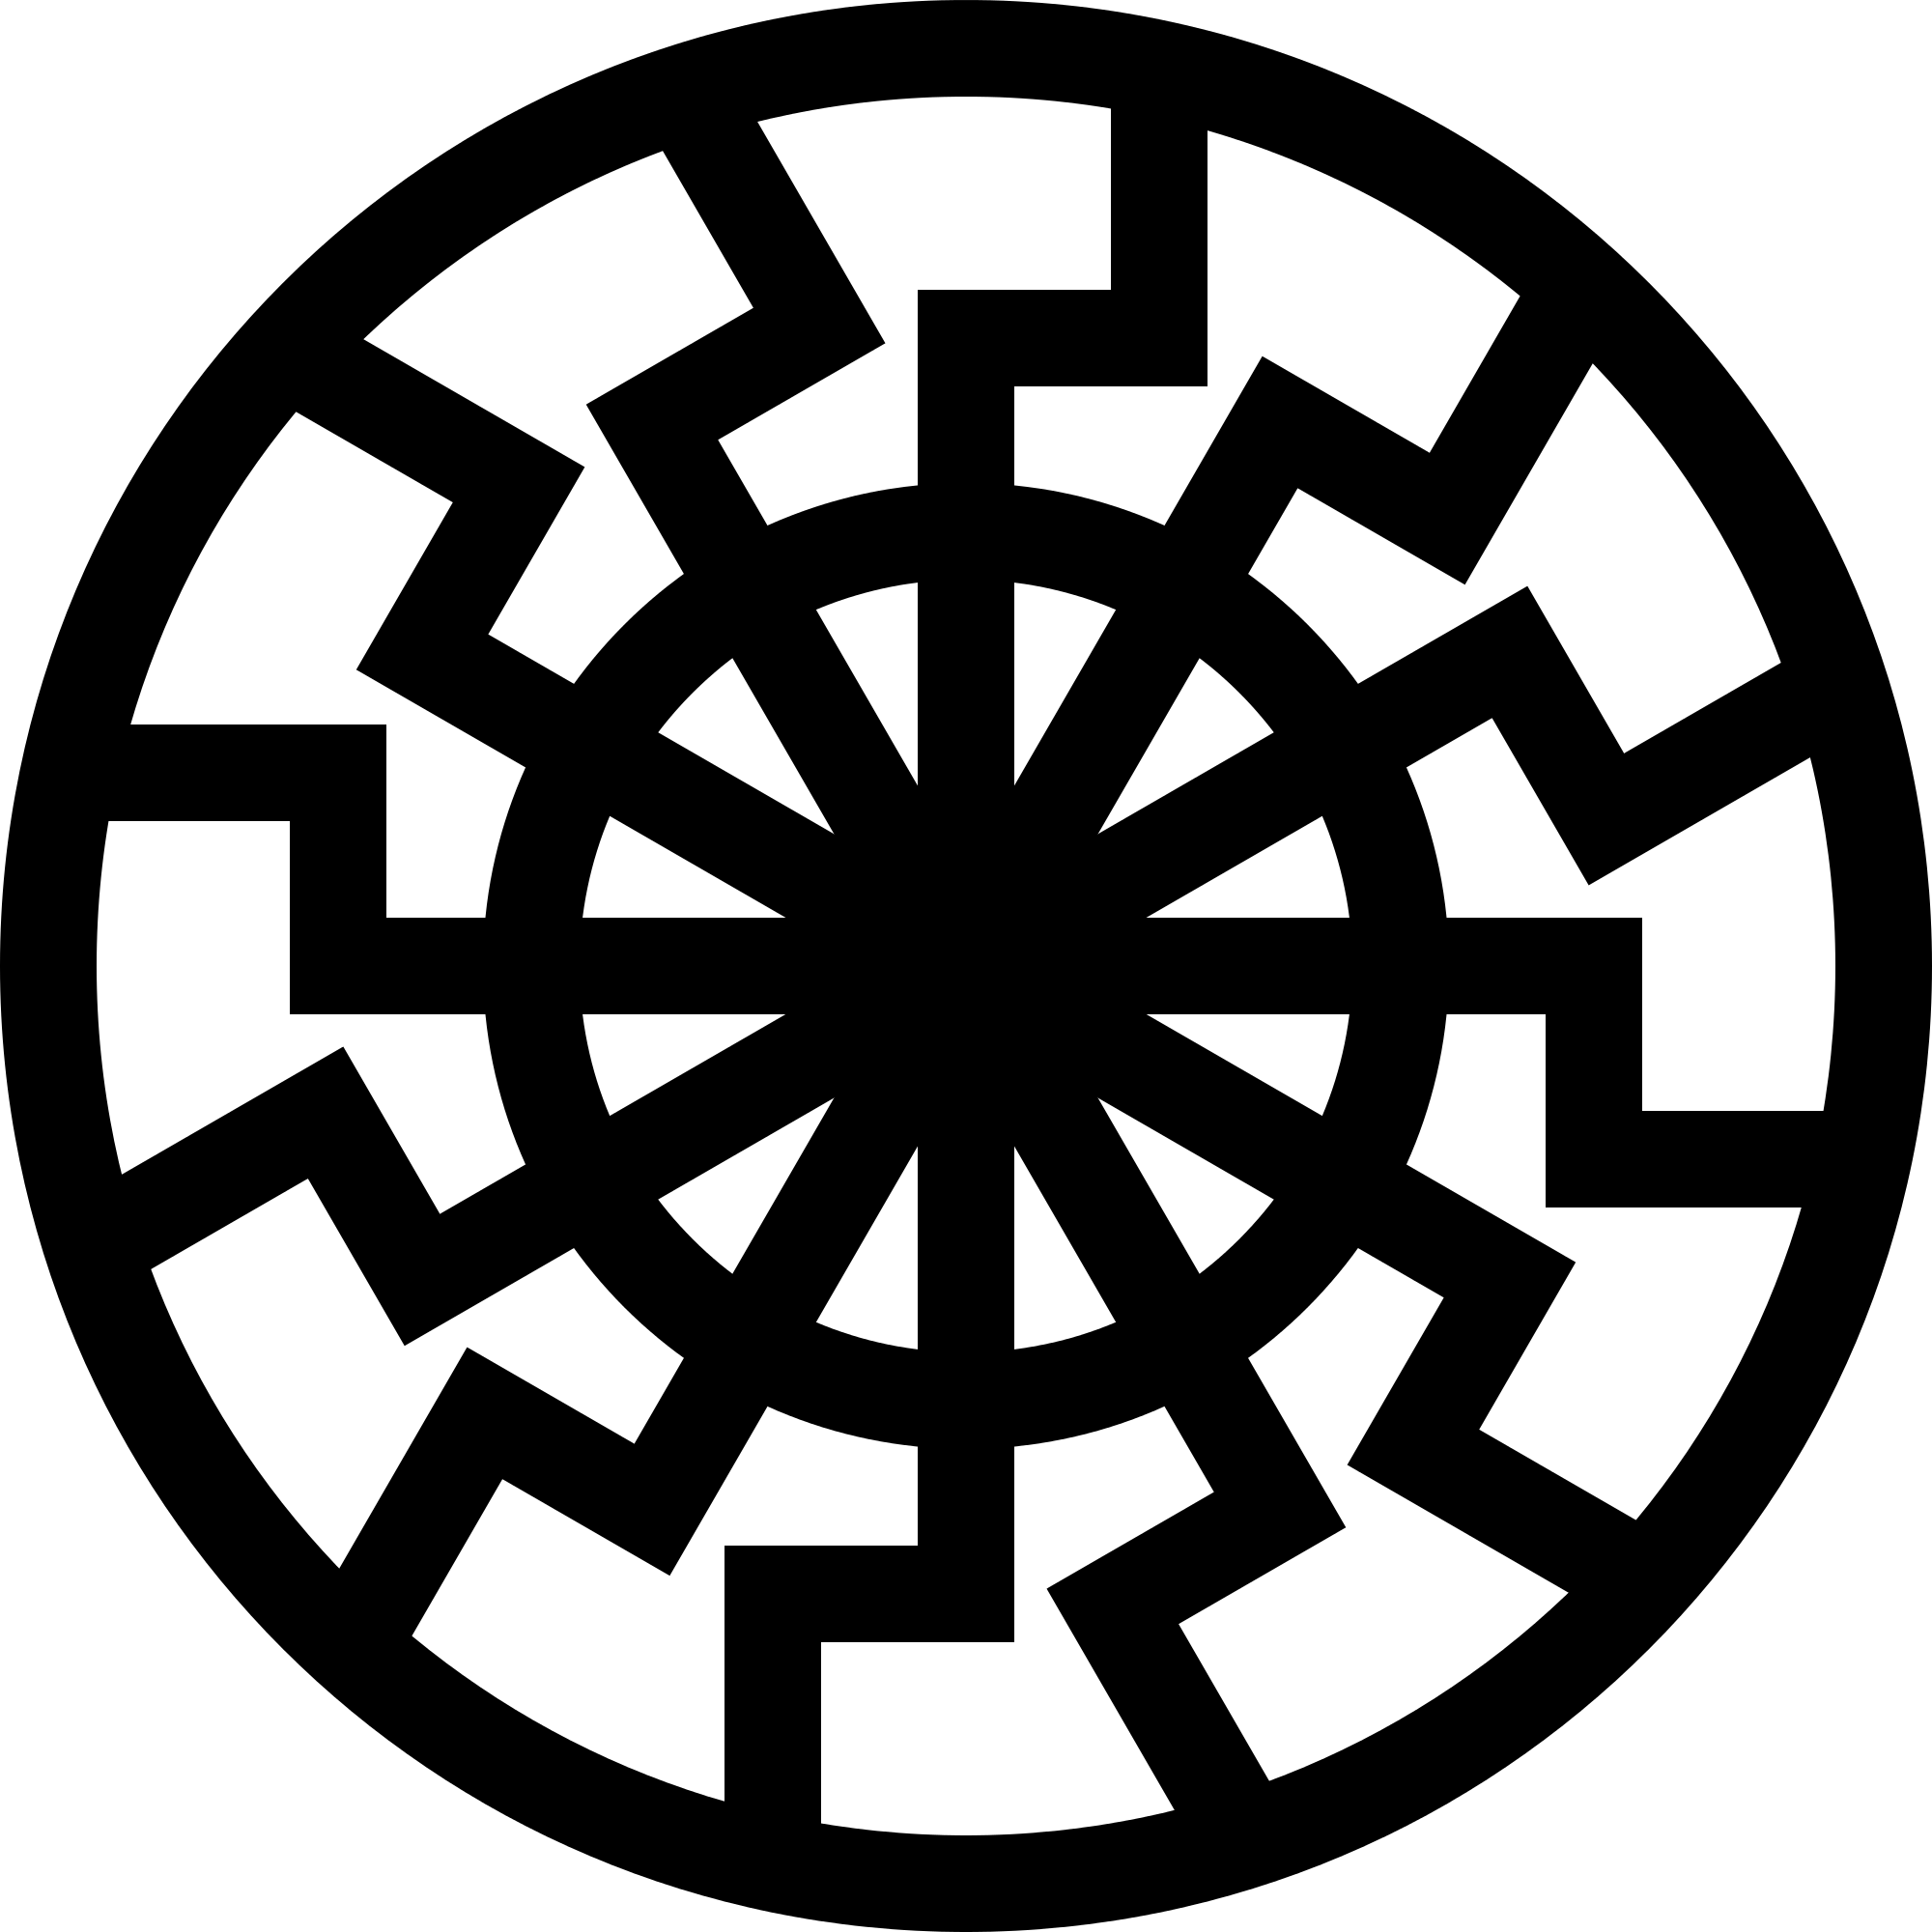 The black sunan alchemical symbol the raven the crow and the the black sunan alchemical symbol the raven the crow and the biocorpaavc Images